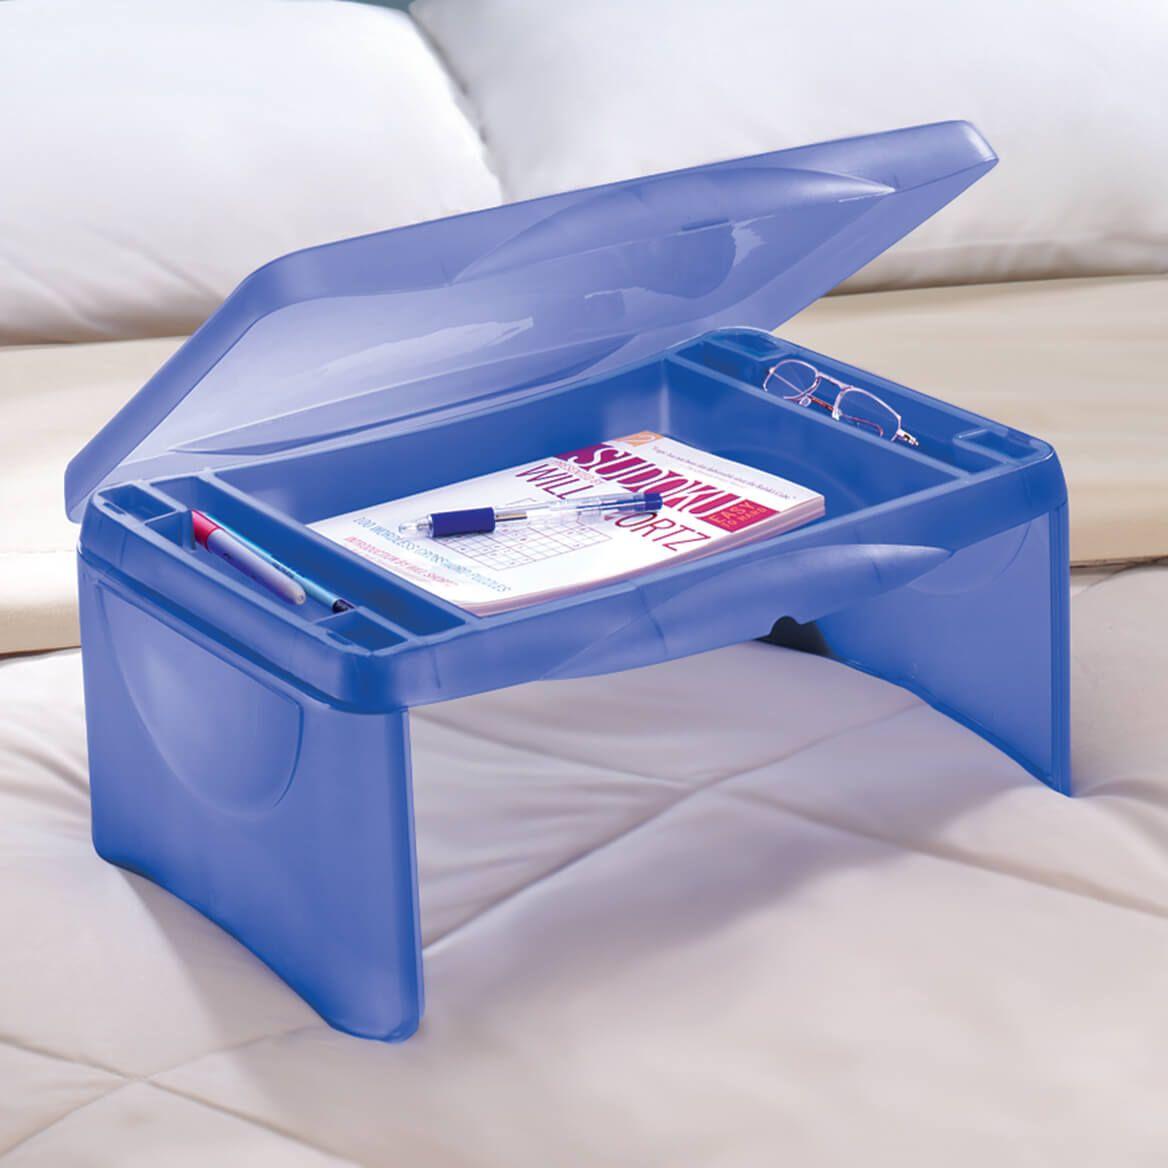 Storage Folding Lap Desk Folding Lap Desk Miles Kimball Lap Desk Lap Desk With Storage Lap Table